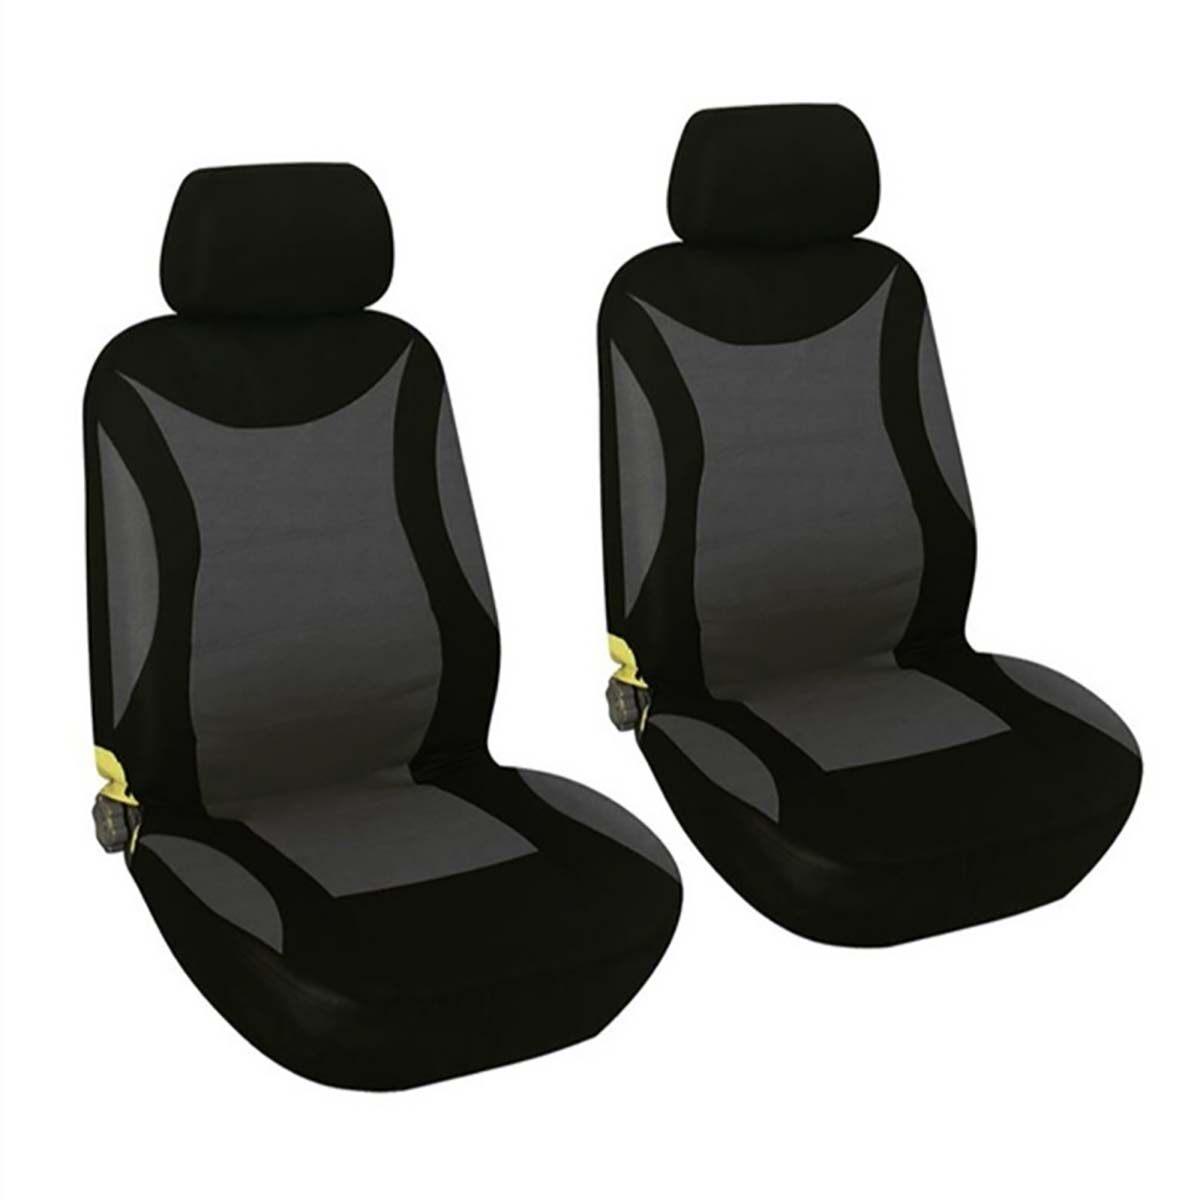 VOLVO 200 300  Universal Car Seat Covers Full Set Grey//Black Velour Fabric 14402